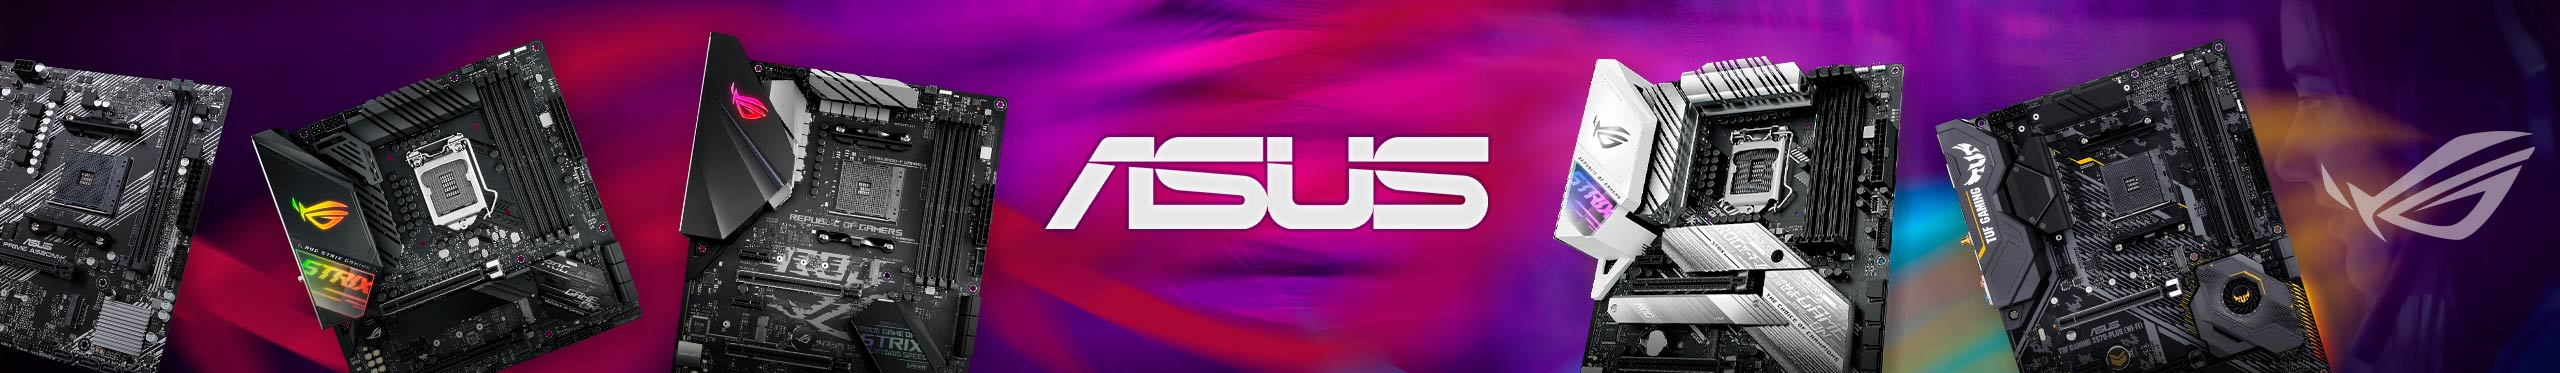 Banner MOBO Asus - Maio 2021